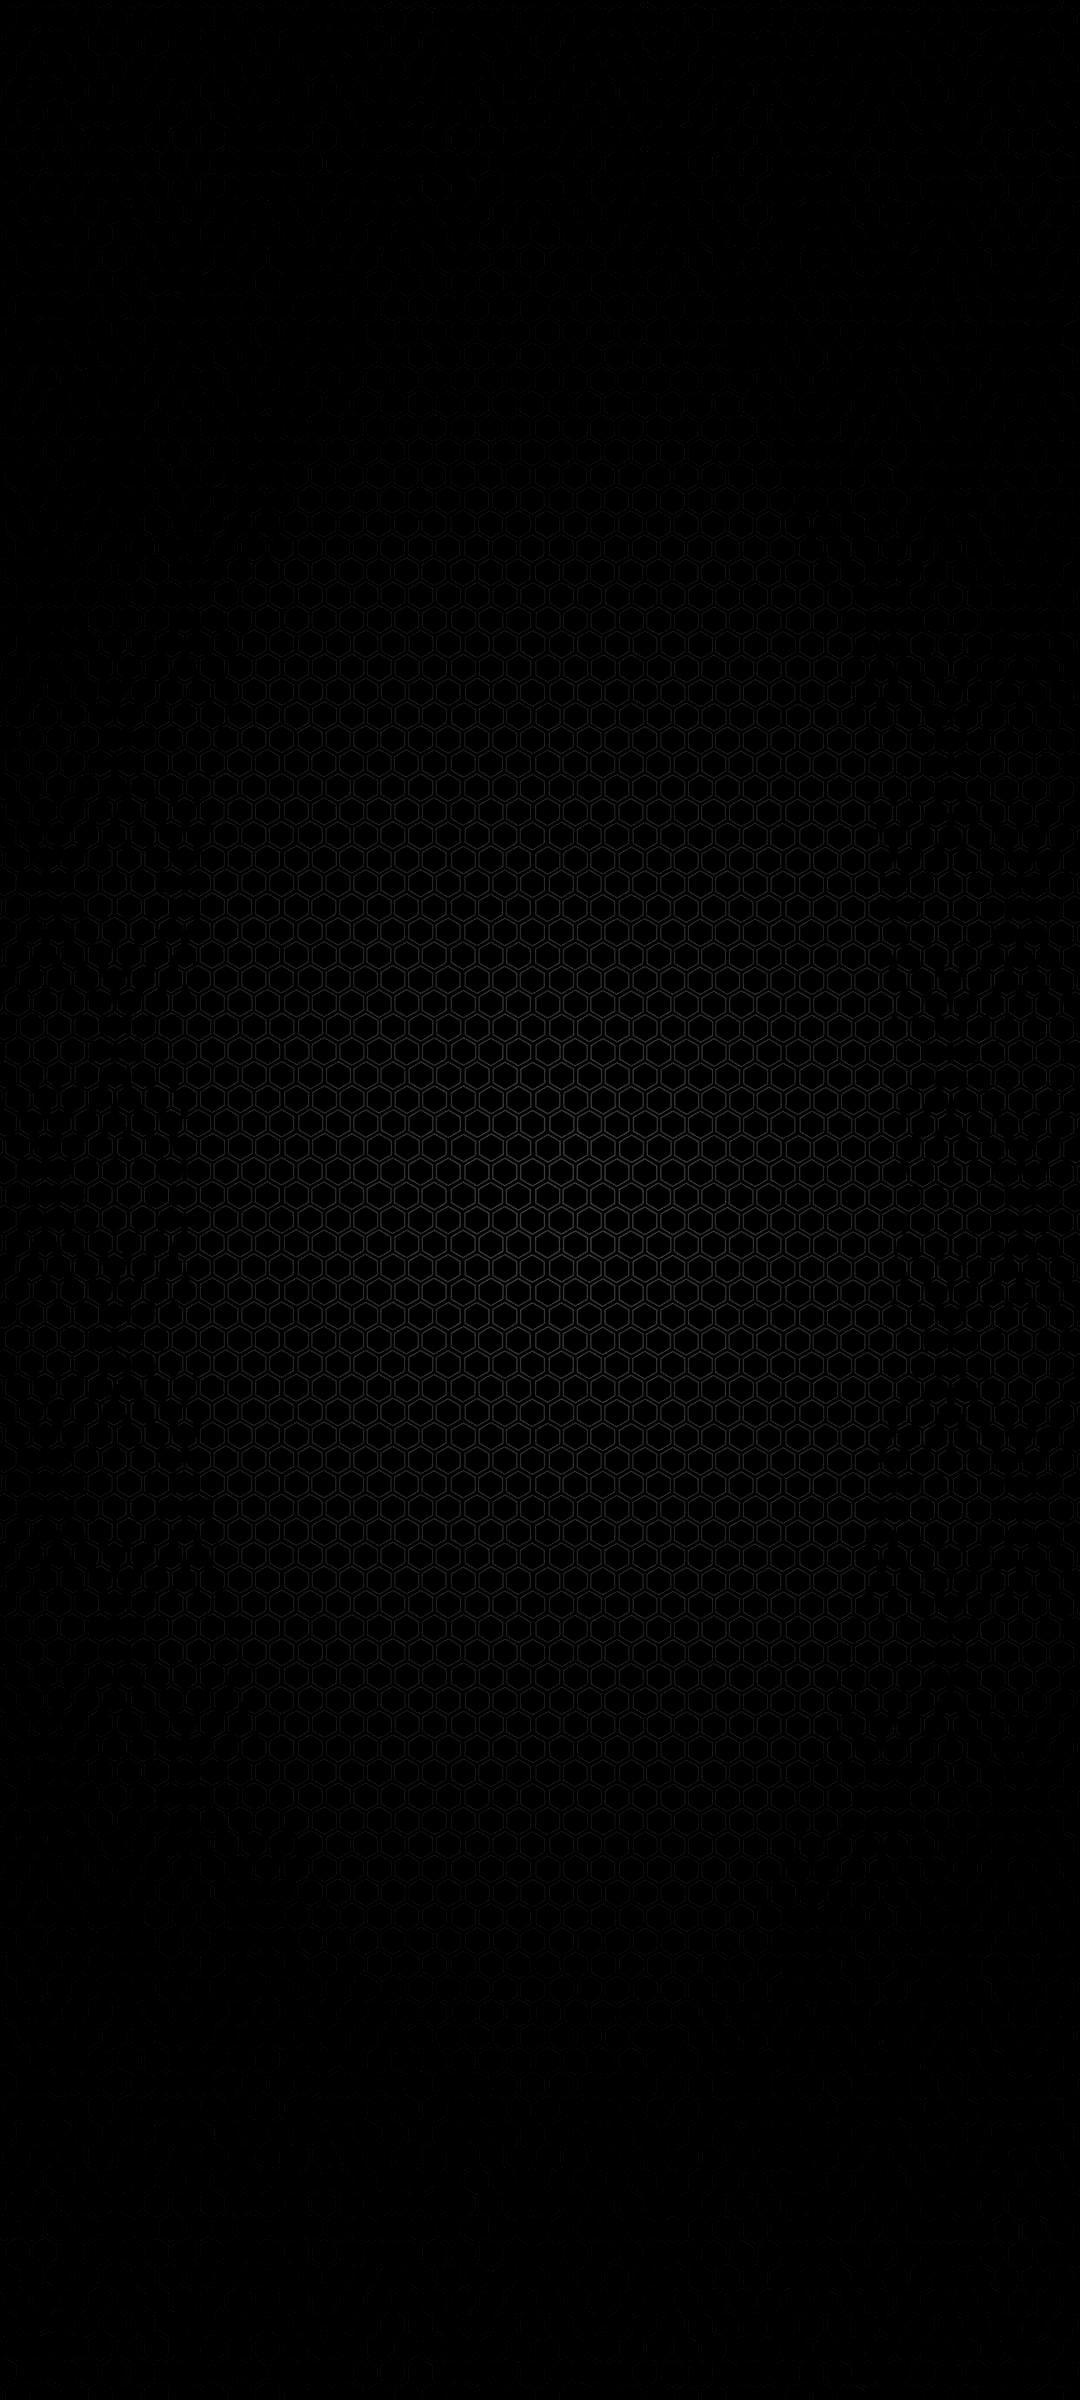 samsung wallpaper a70 Samsung Galaxy A70 Wallpapers